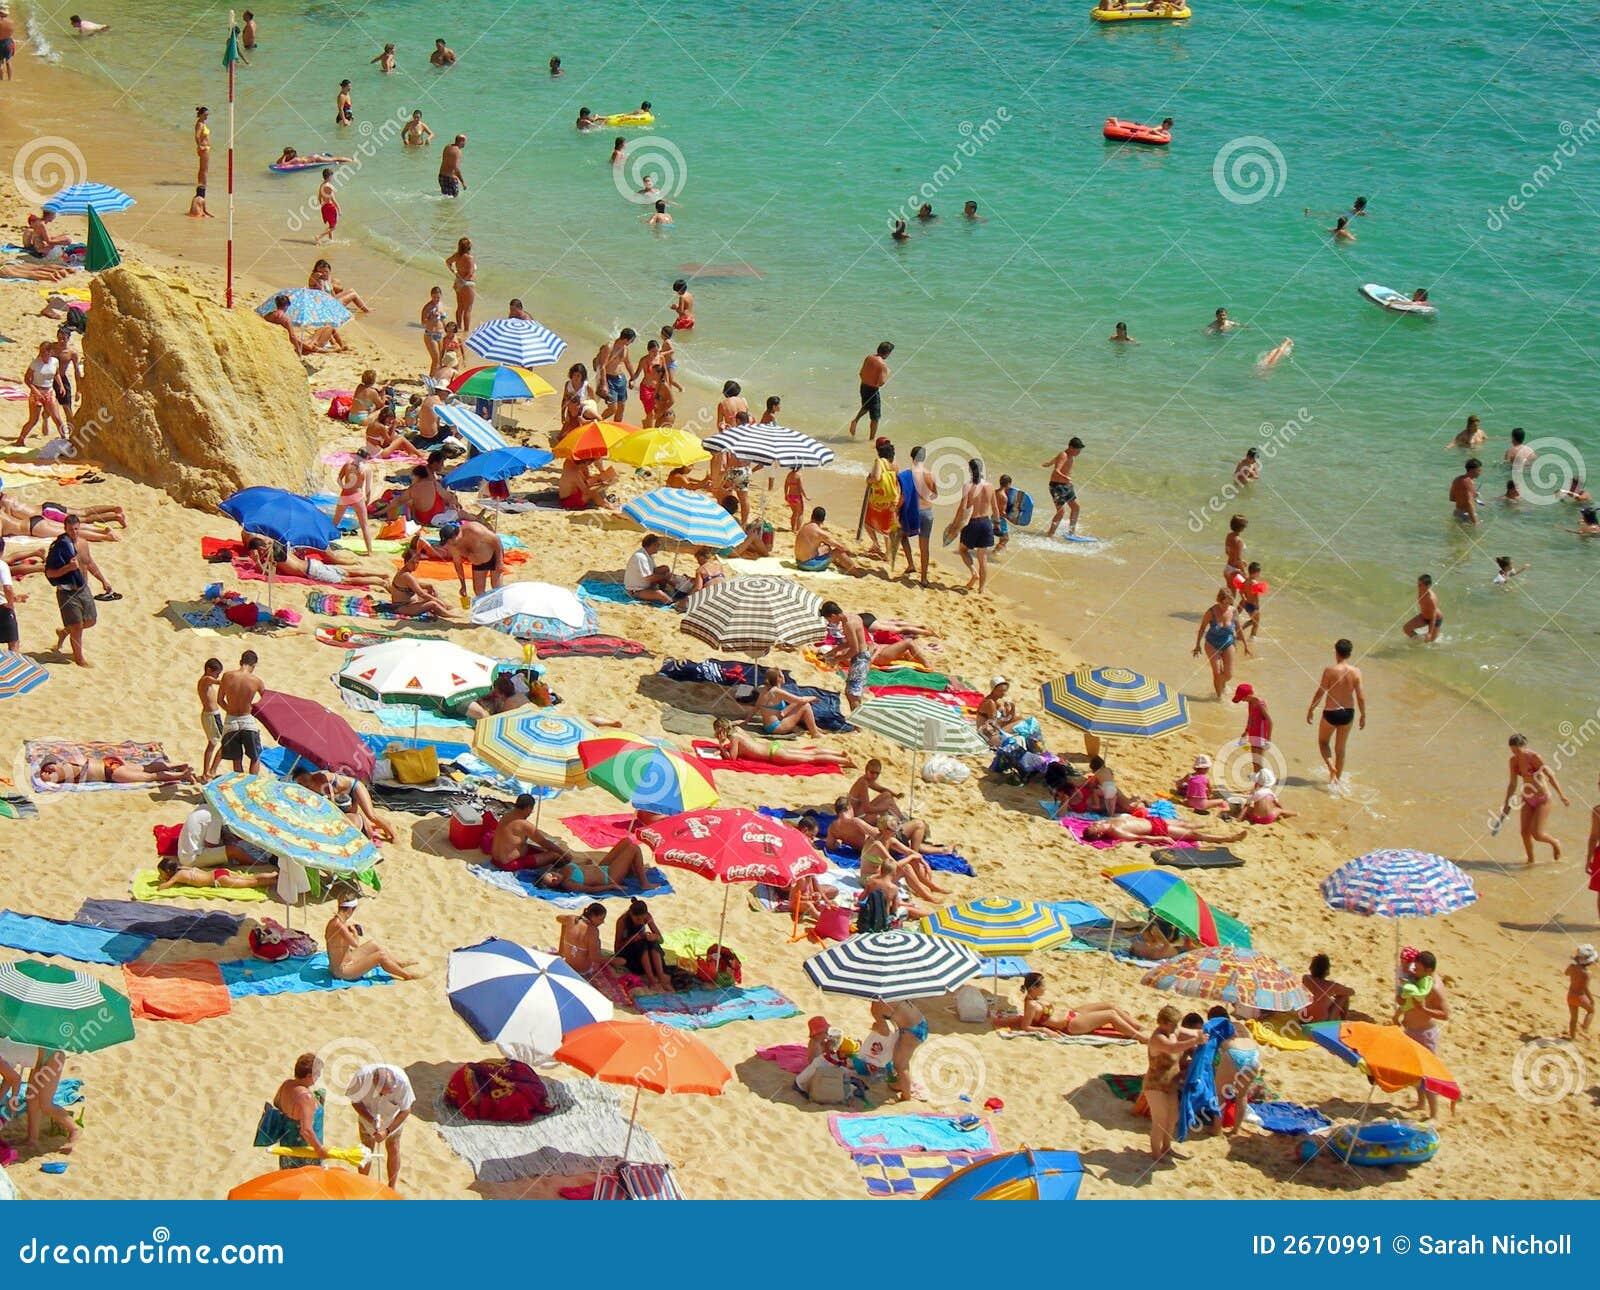 Colourful Beach Stock Image - Image: 2670991 - photo#36